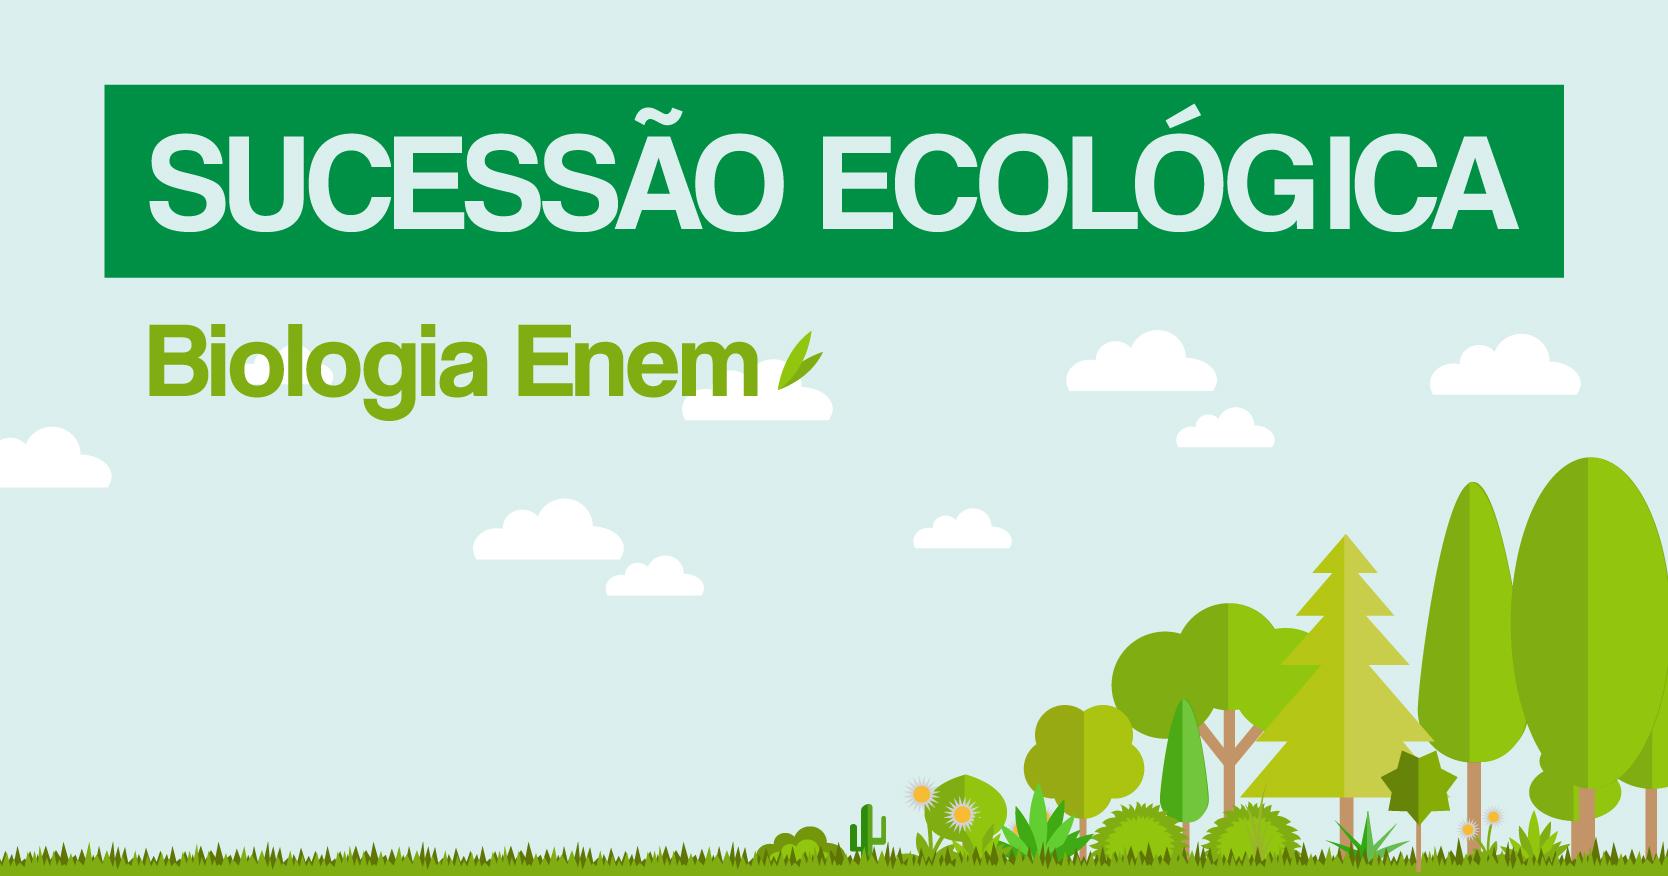 sucessao ecologica